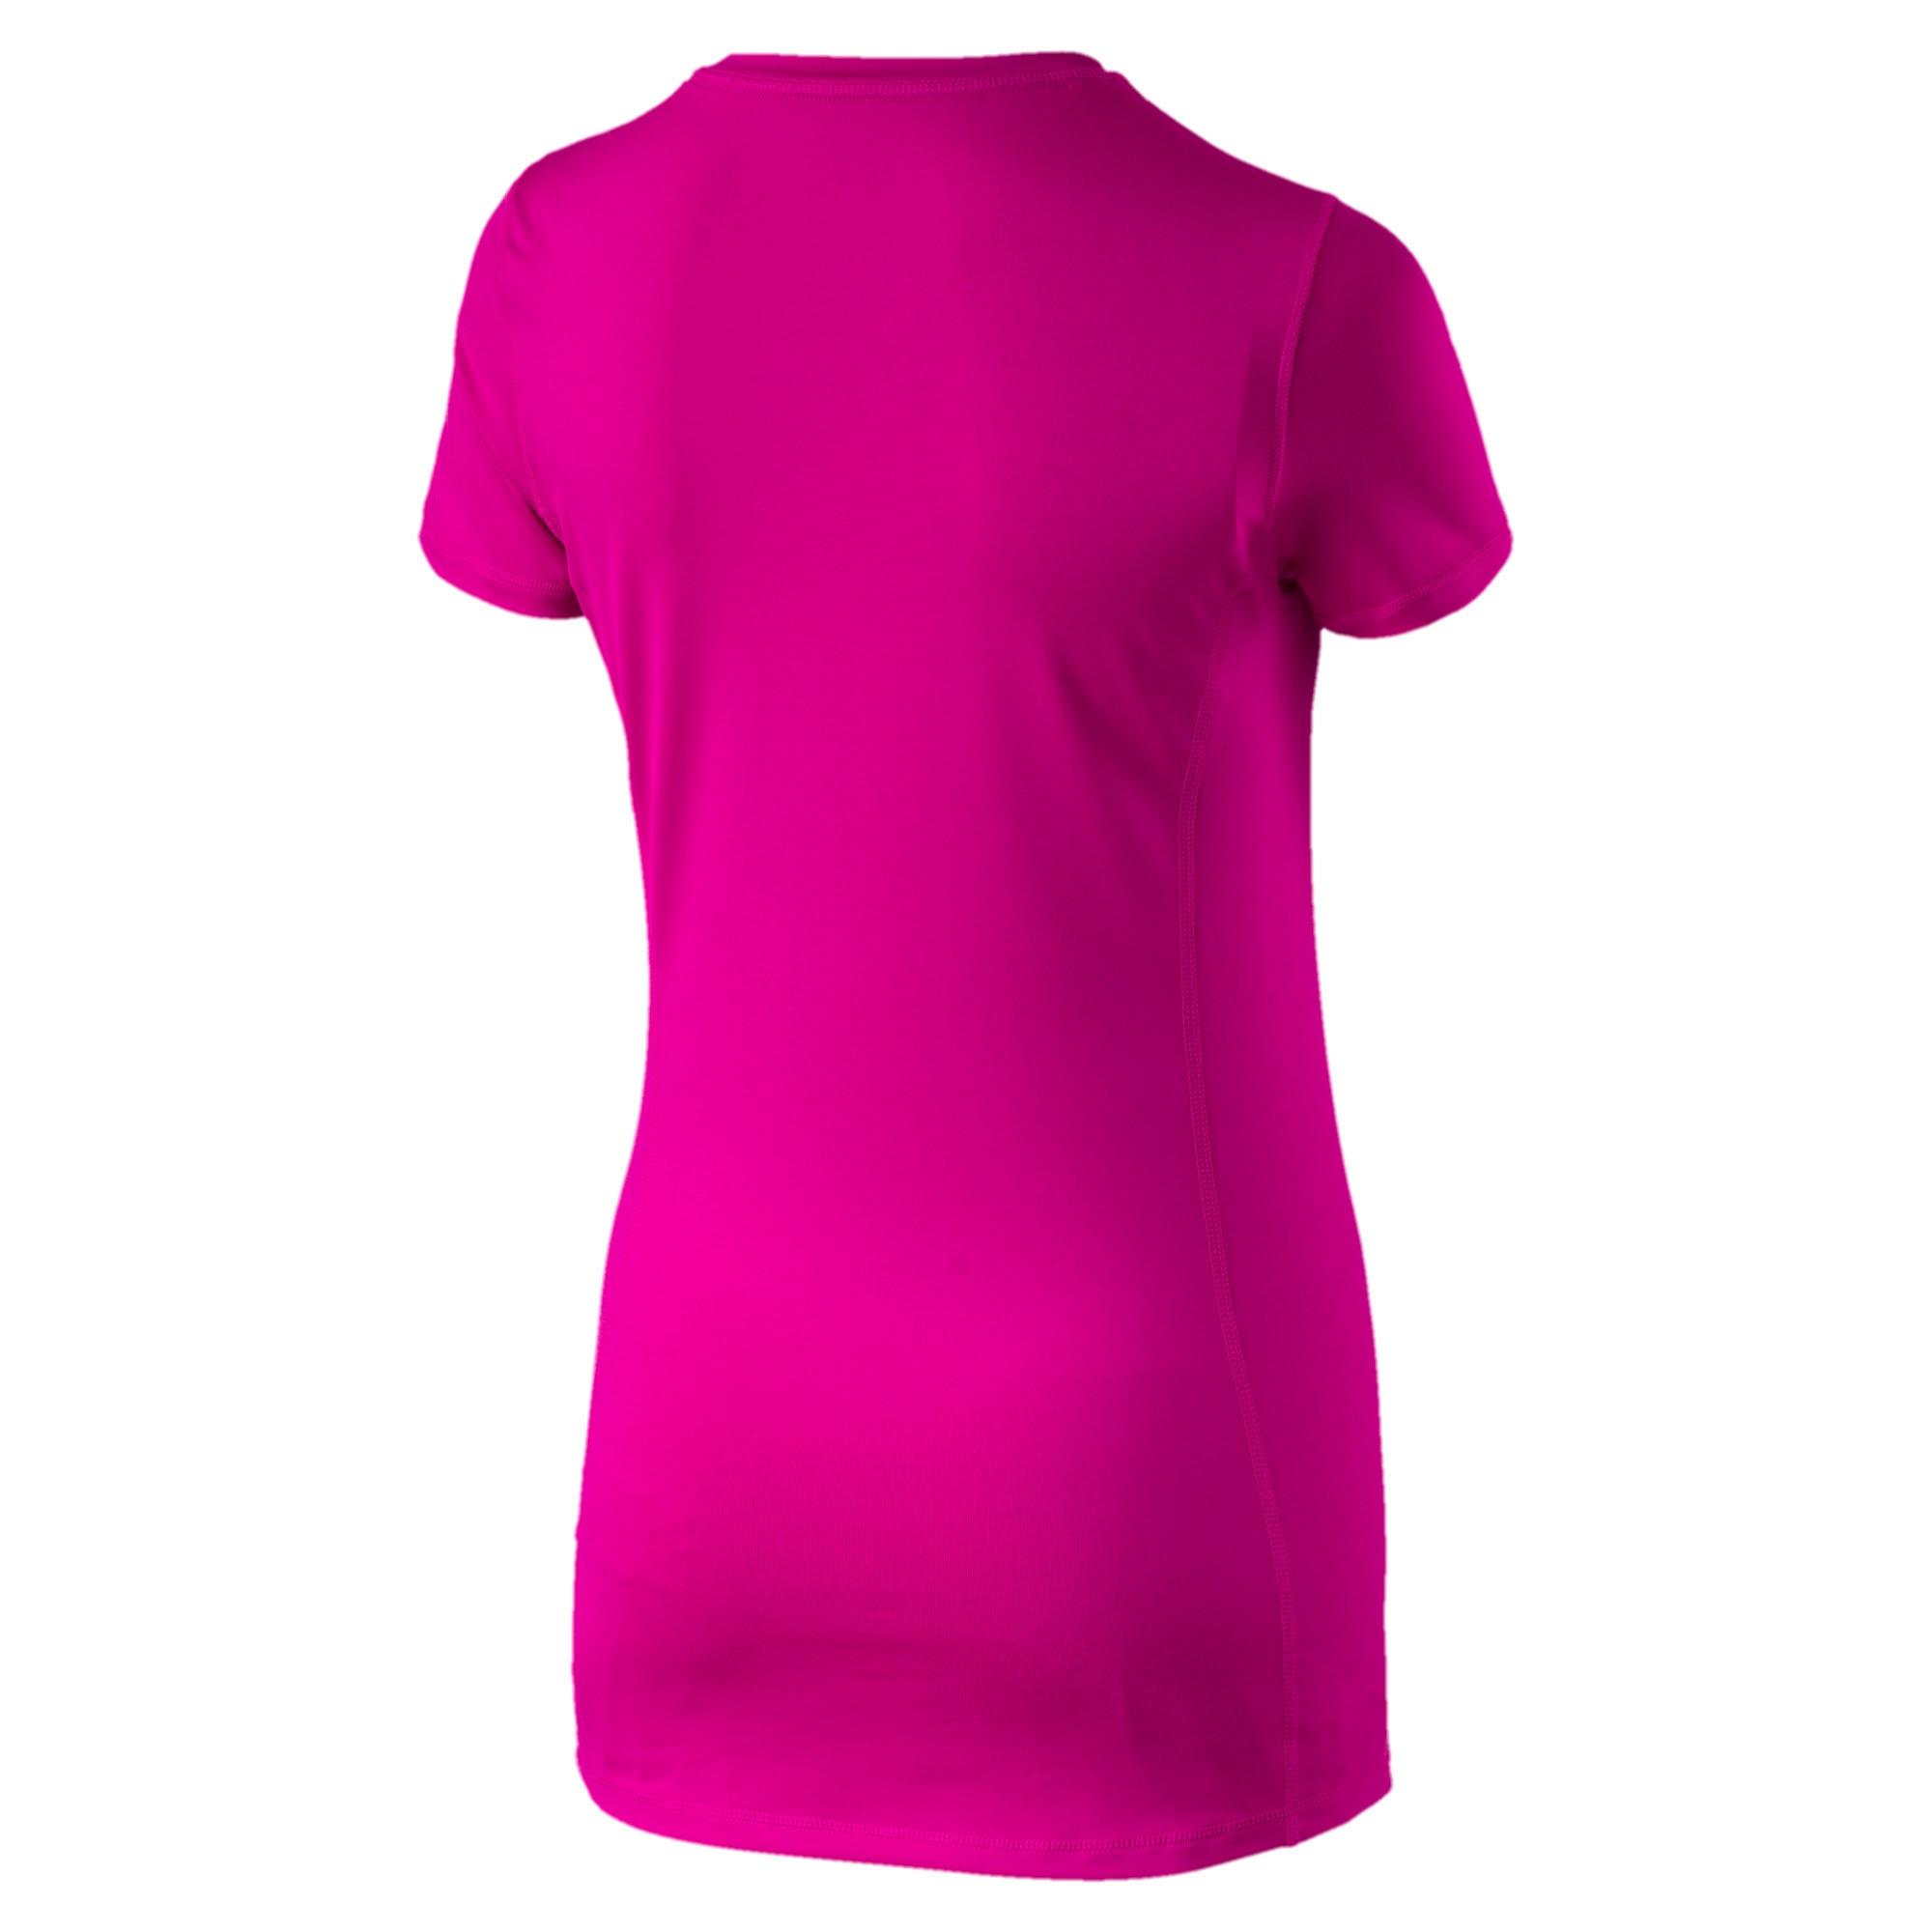 Thumbnail 5 of Training Women's Essential T-Shirt, ULTRA MAGENTA, medium-IND